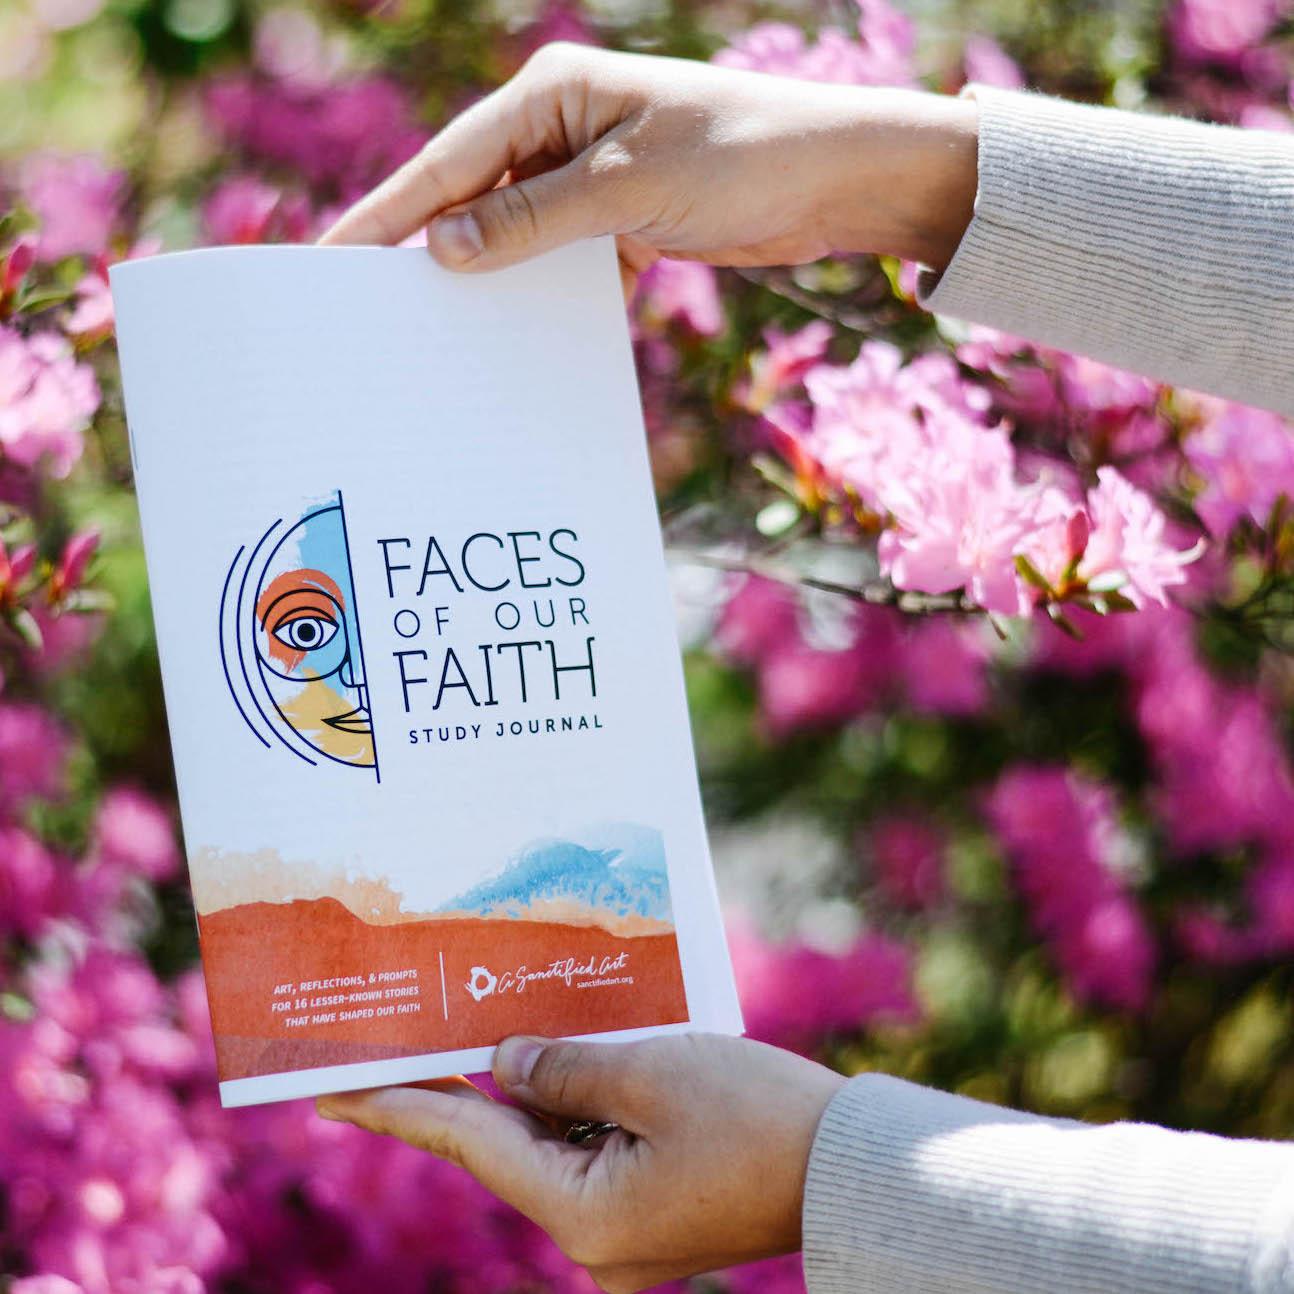 Faces of our Faith Study Journal $18-$95